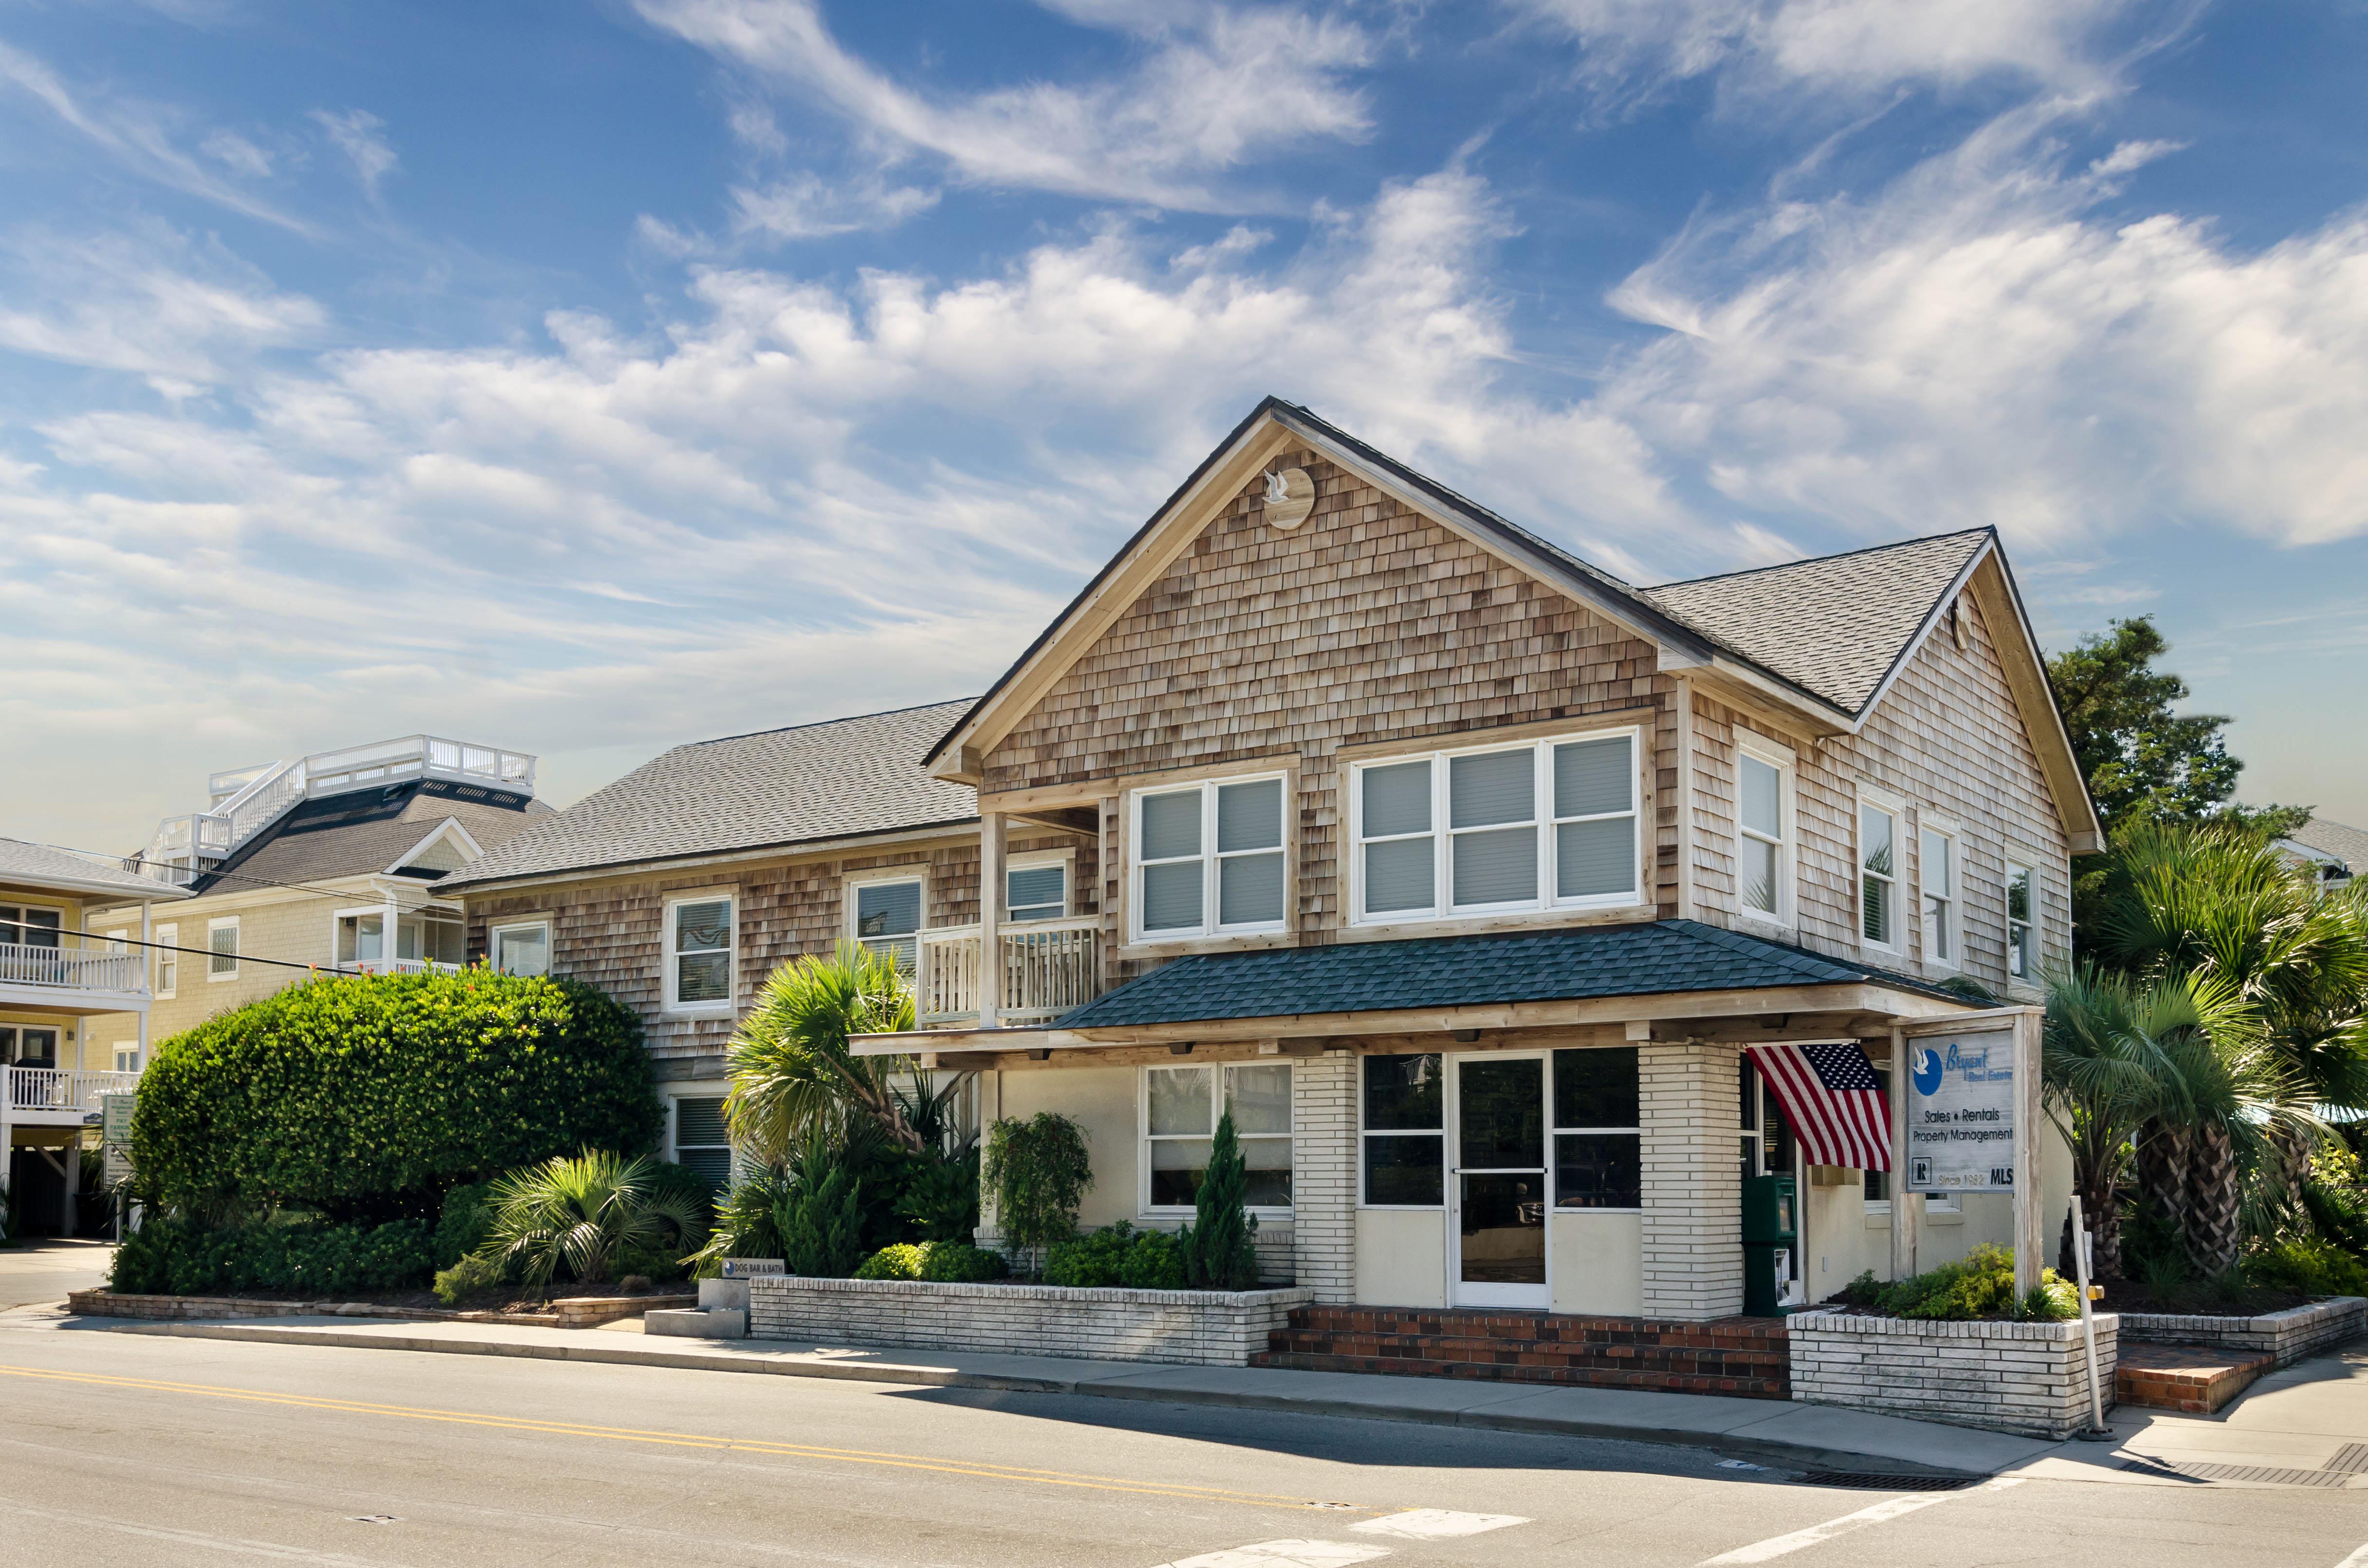 Bryant Real Estate | Wrightsville Beach, NC